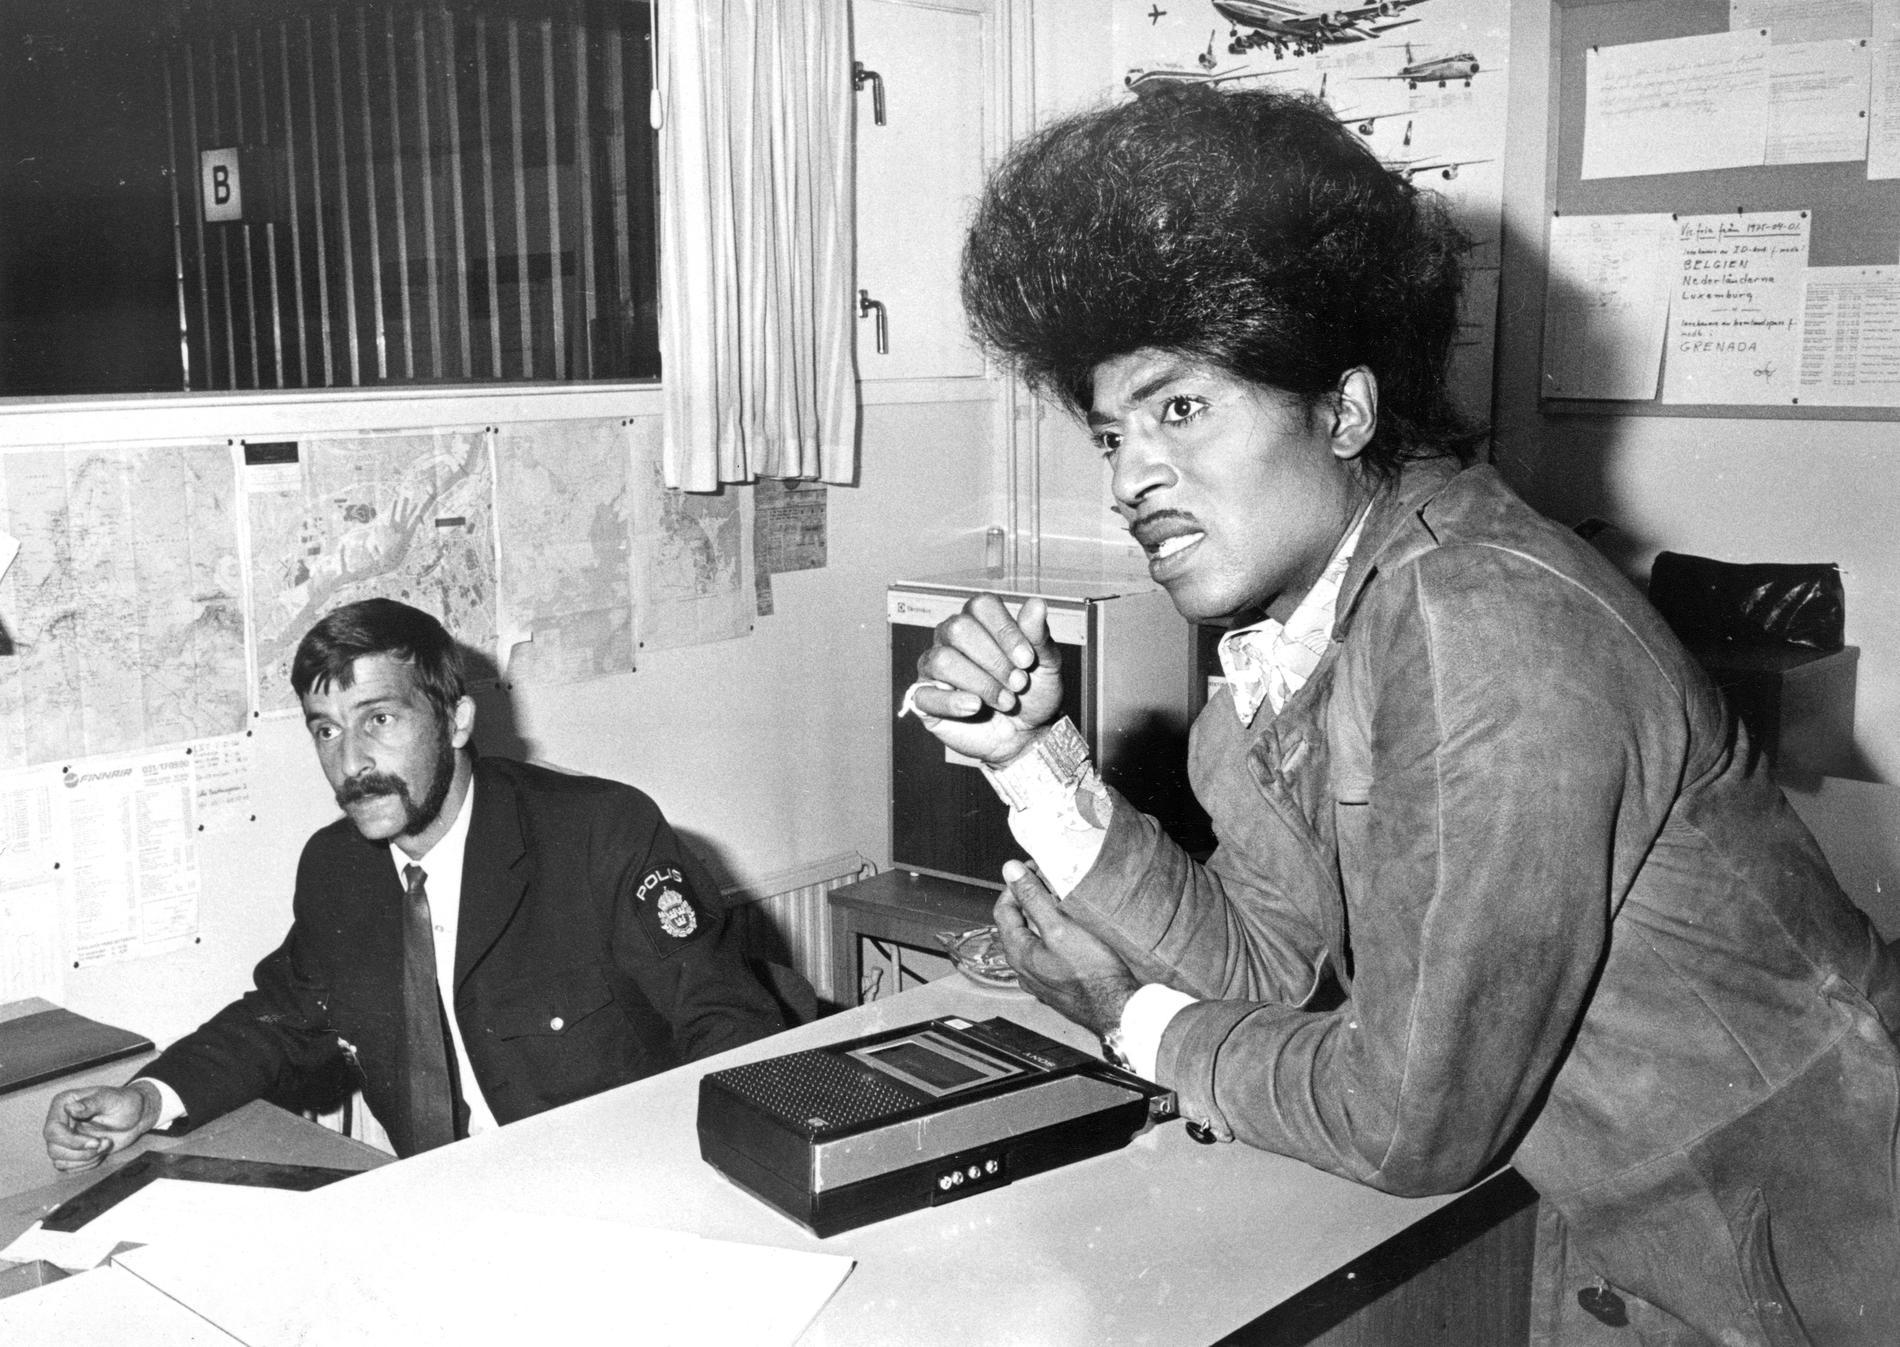 Richard Wayne Penniman, Little Richard, fastnade i passkontrollen i Göteborg 1975